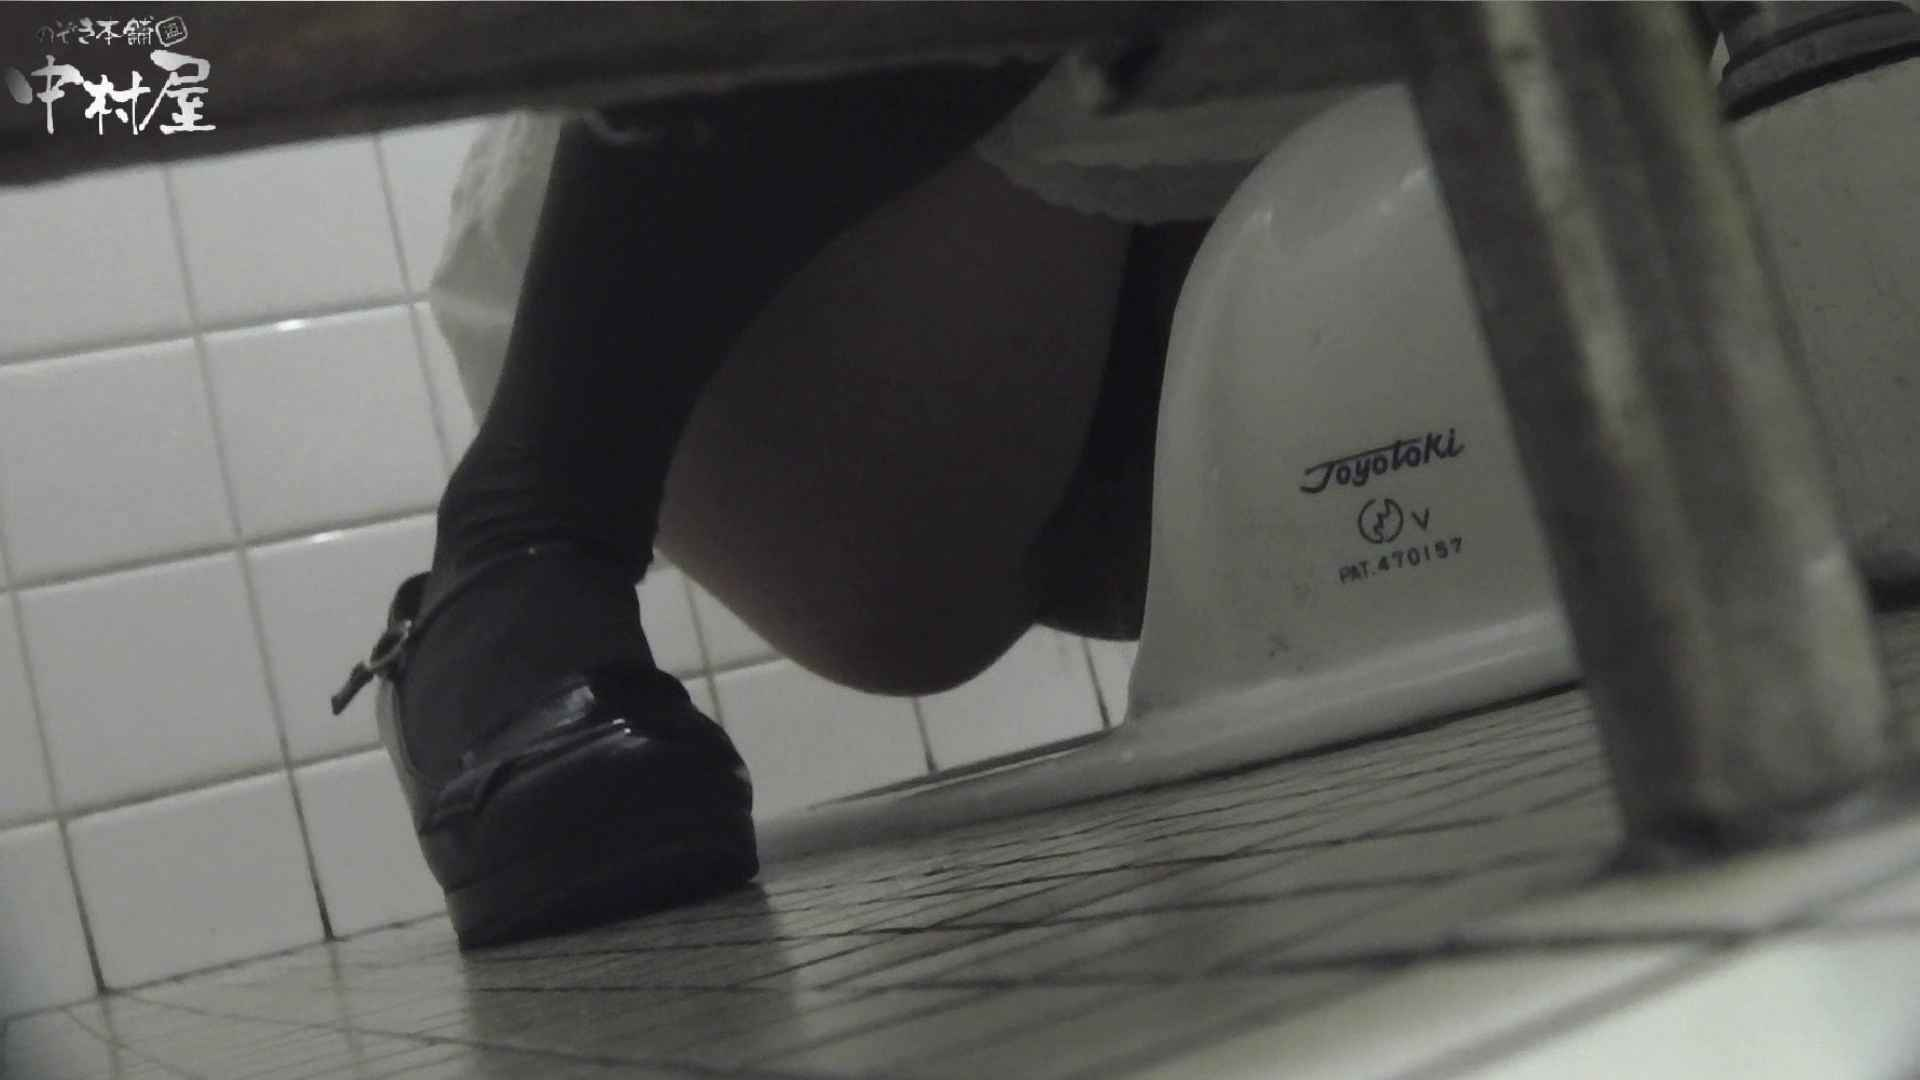 vol.42 命がけ潜伏洗面所! カカト上げながら・硬度強(太)・180g プライベート 盗撮アダルト動画キャプチャ 102画像 31